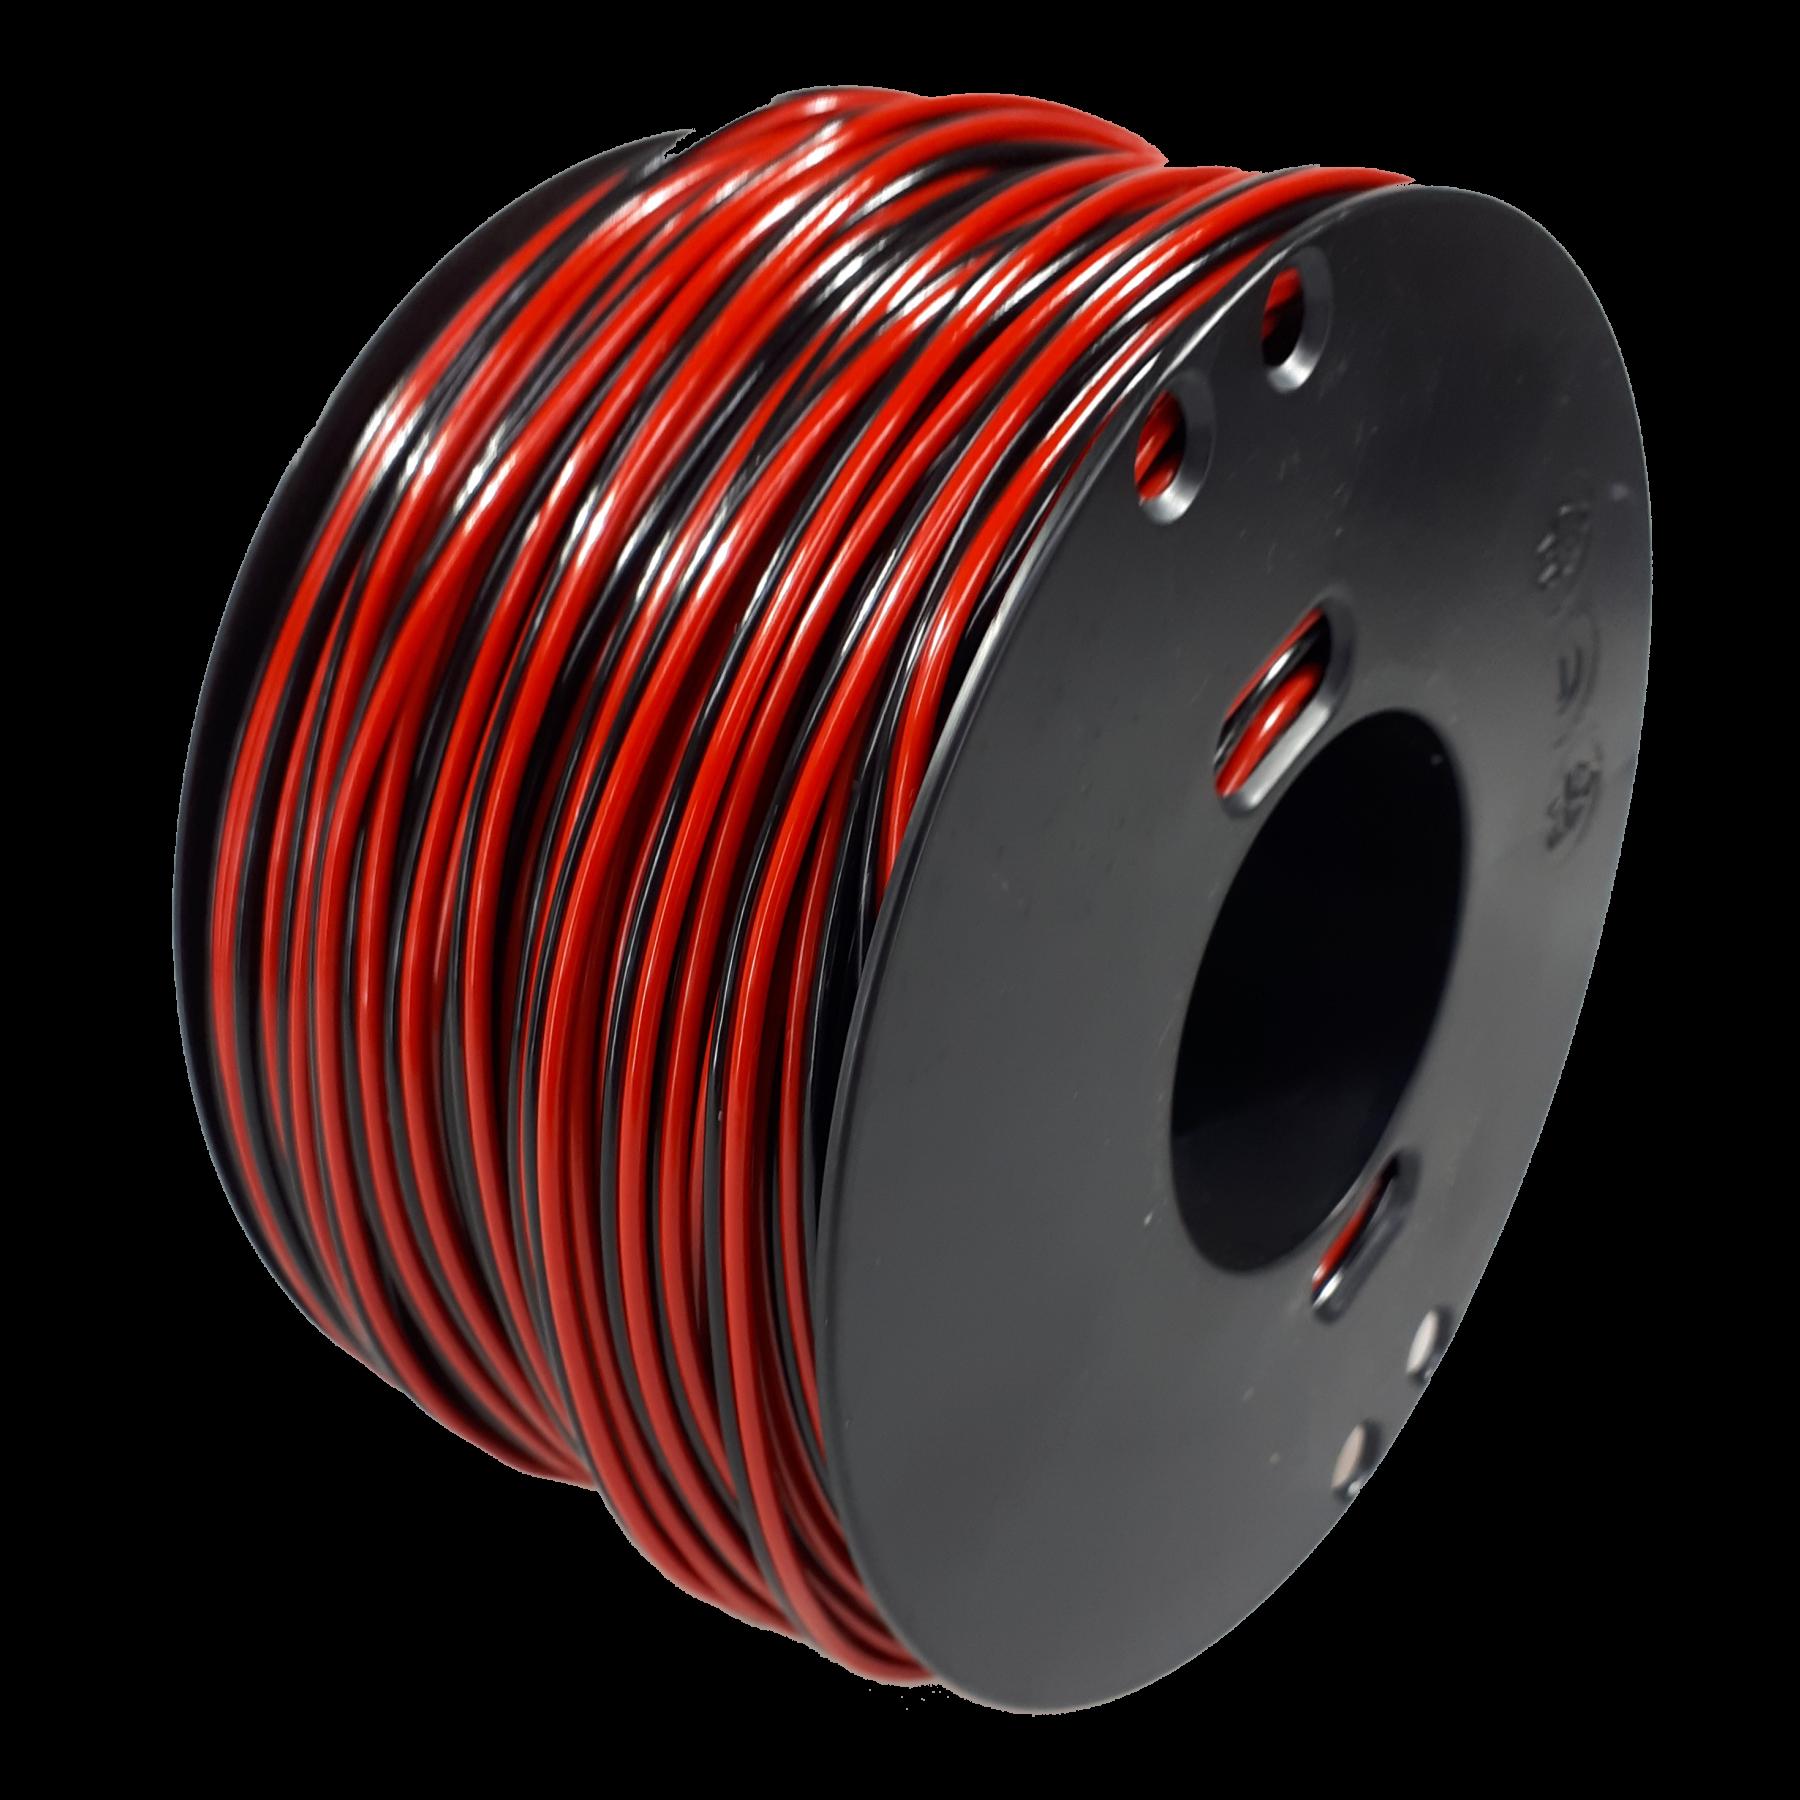 Luidspreker kabel 50m 2x2,5mmq